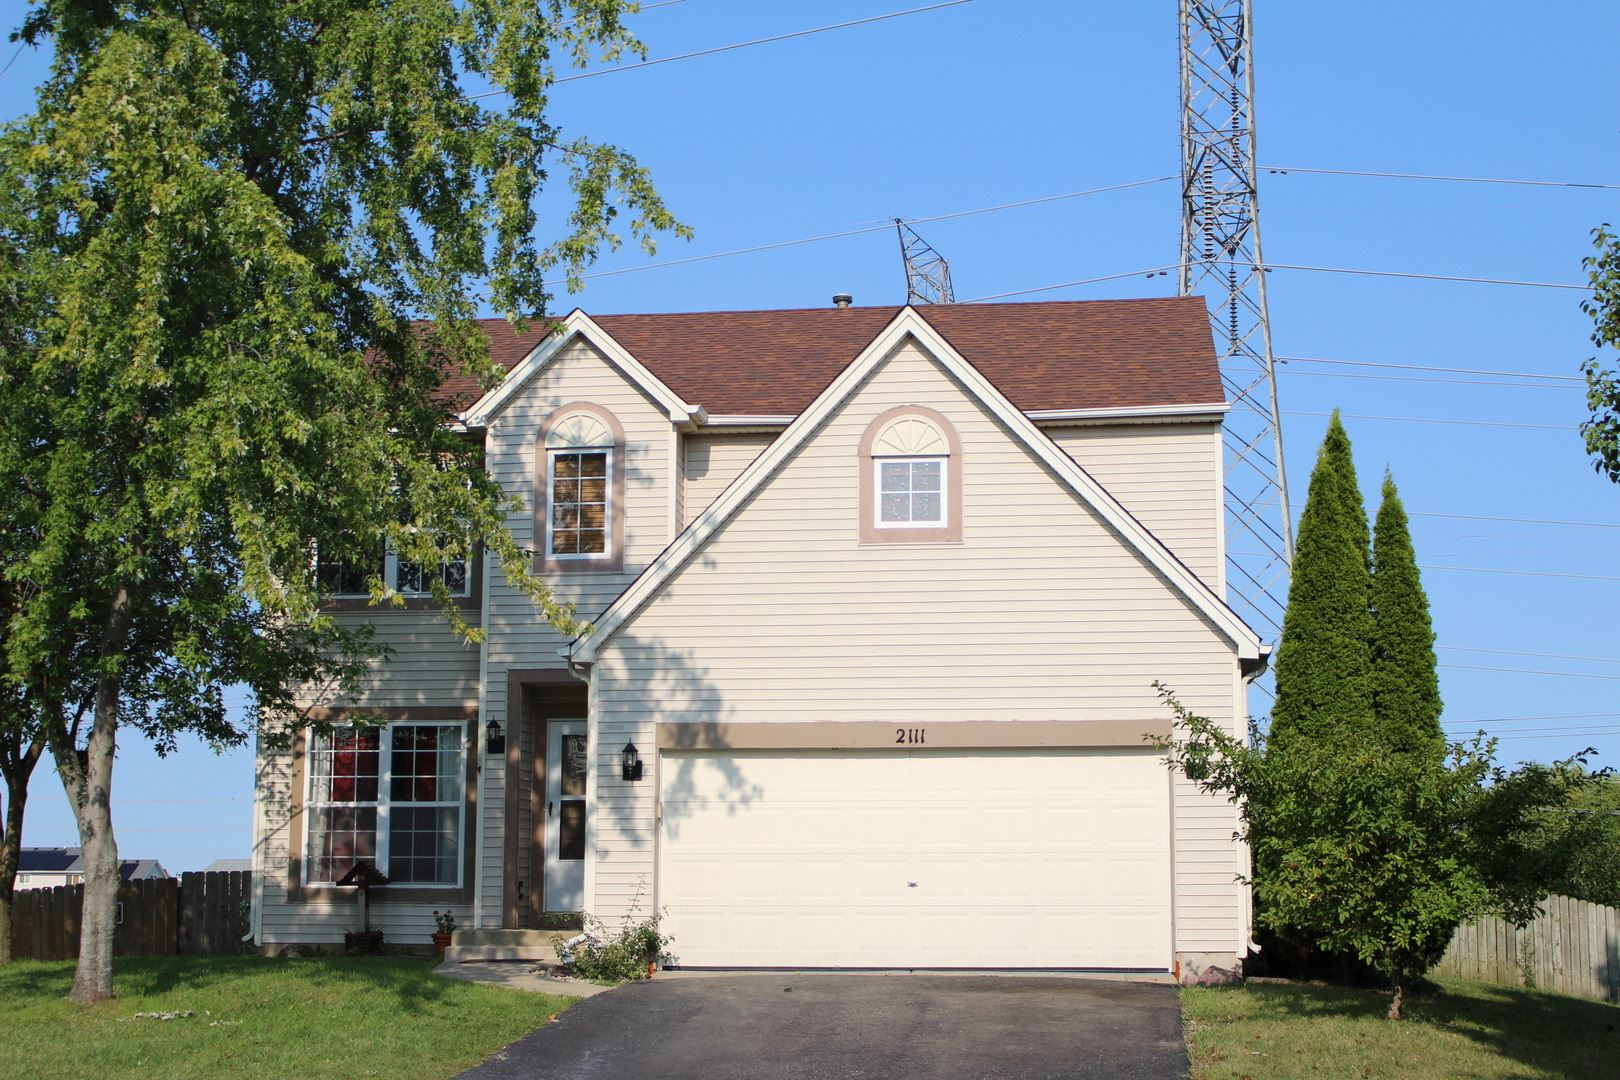 2111 Winding Lakes Drive, Plainfield, IL 60586 - #: 11215396